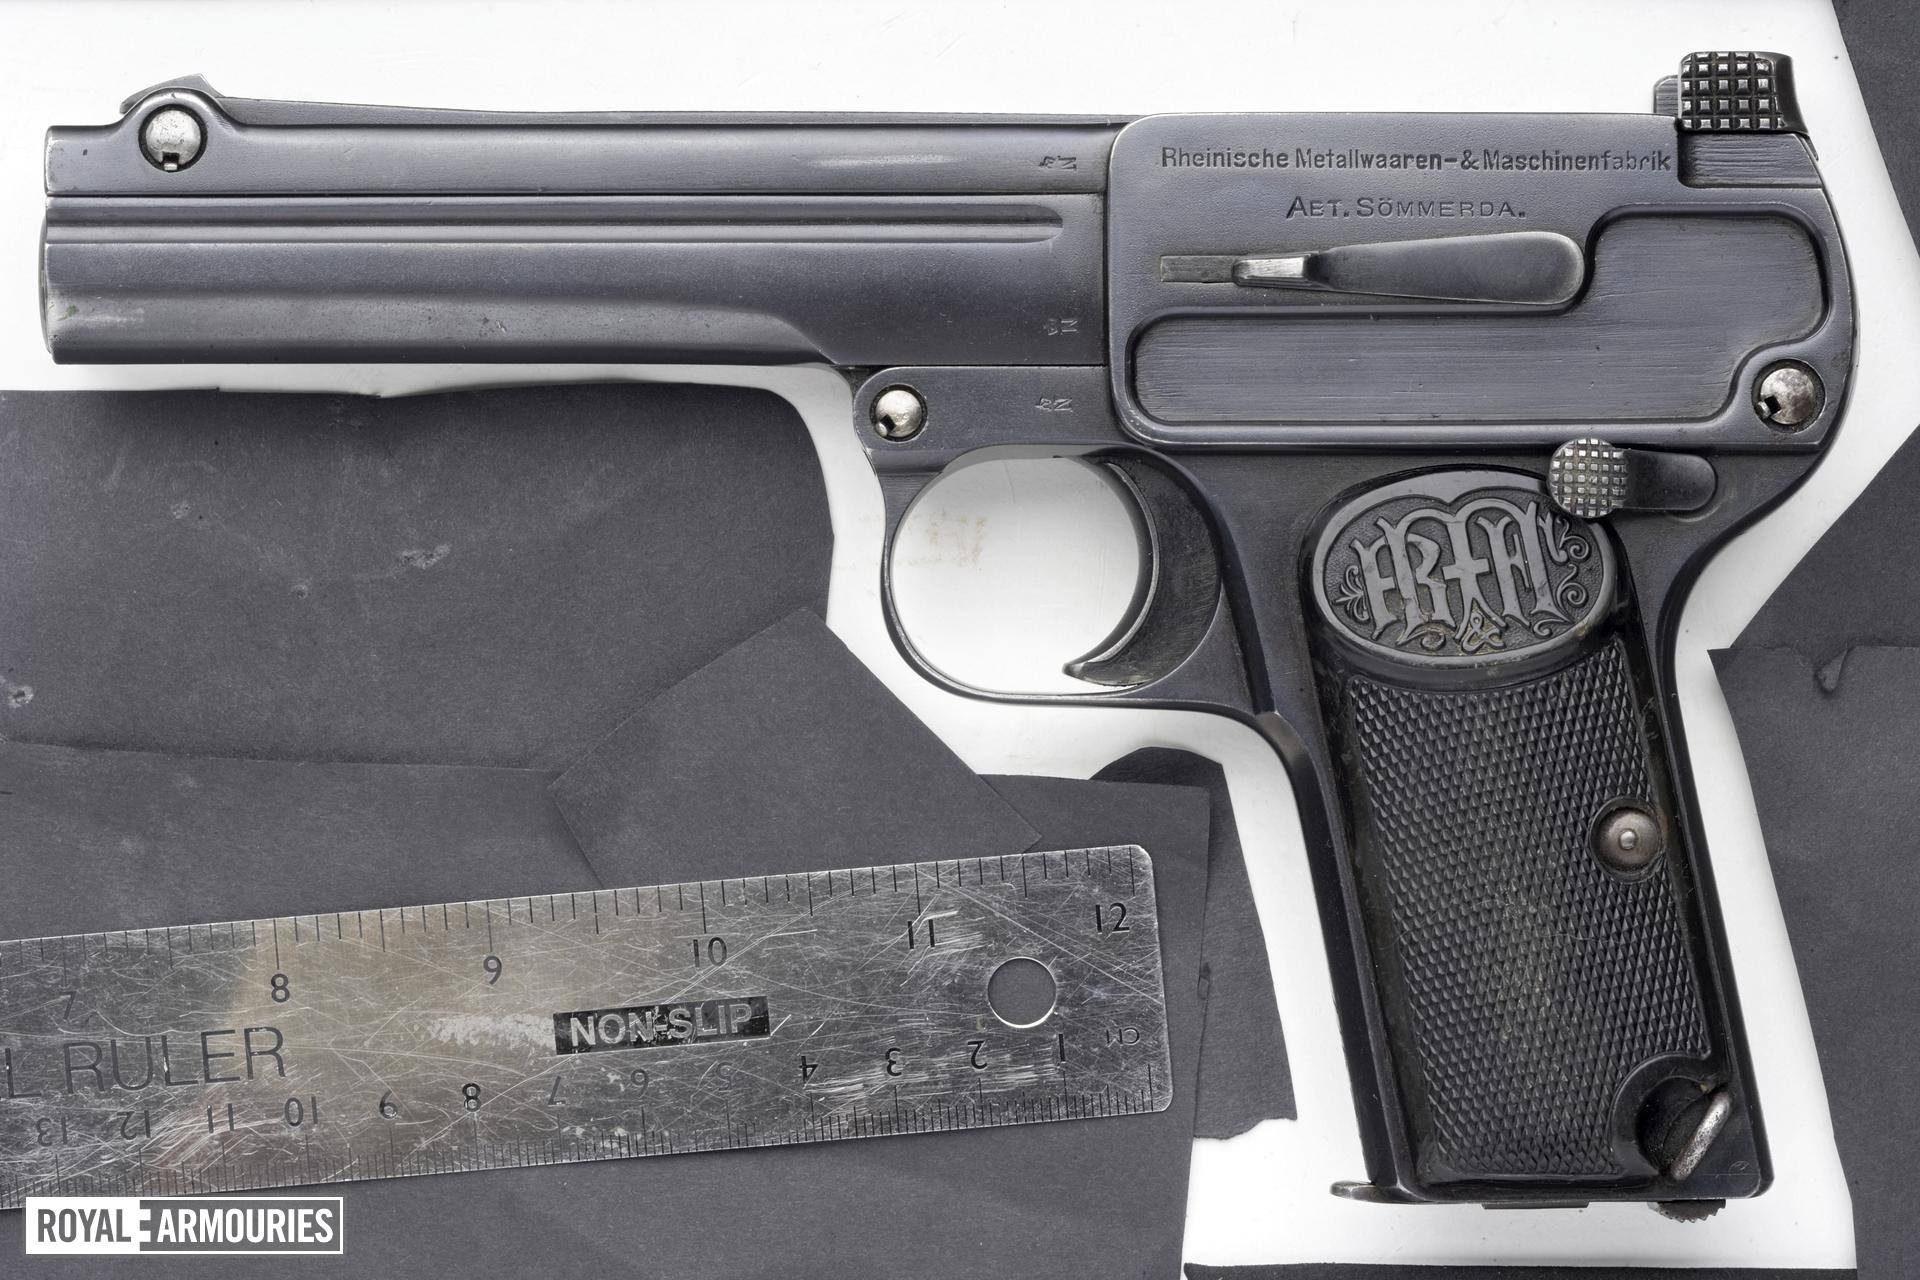 Centrefire self-loading pistol - Dreyse